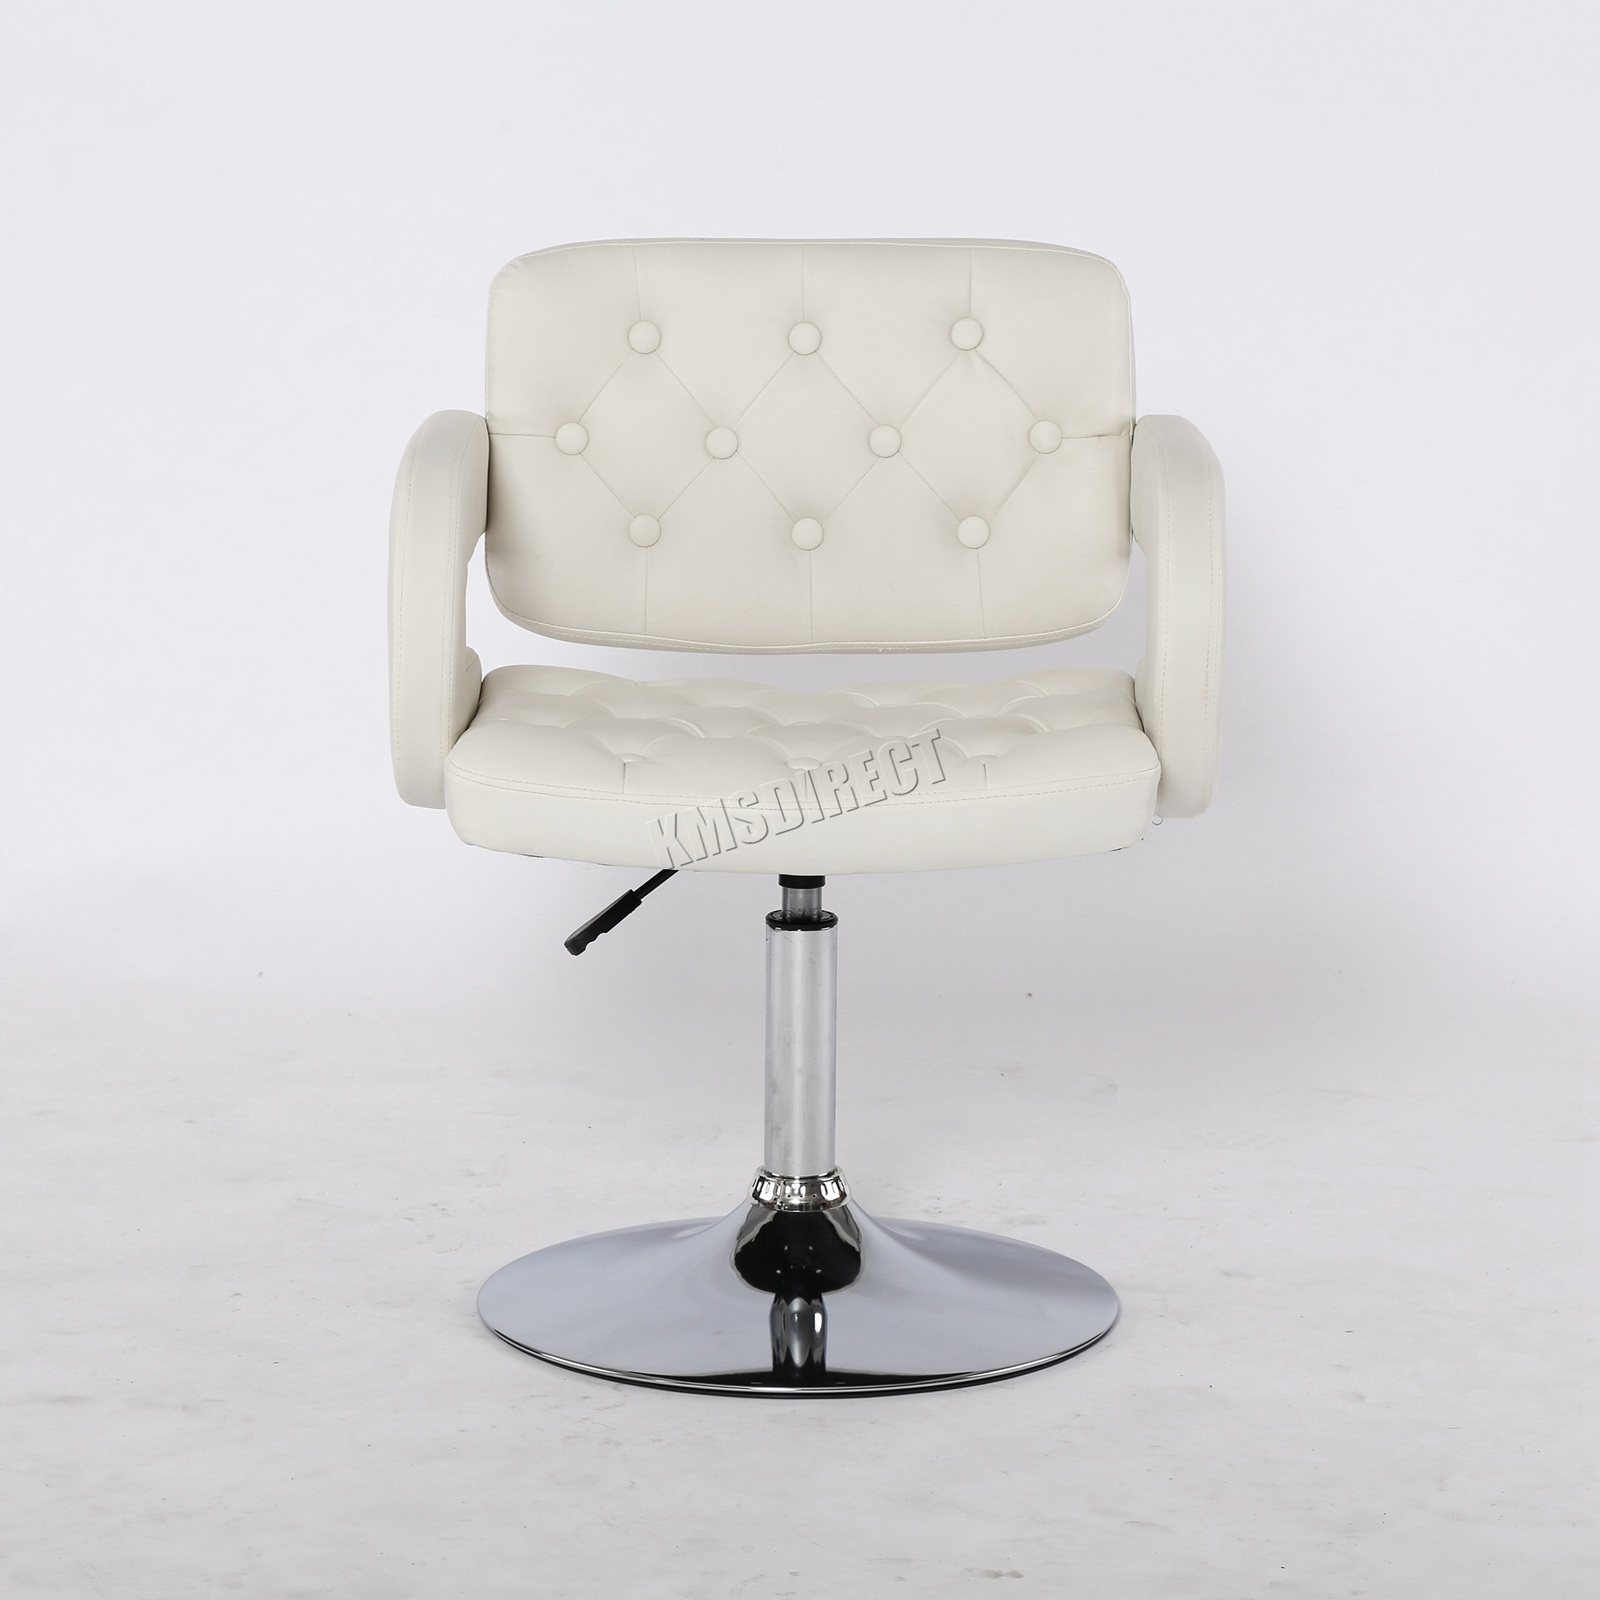 WestWood-Beauty-Salon-Chair-Barber-Hairdressing-Hair-Cut-PU-Leather-Modern-SC02 miniatuur 23